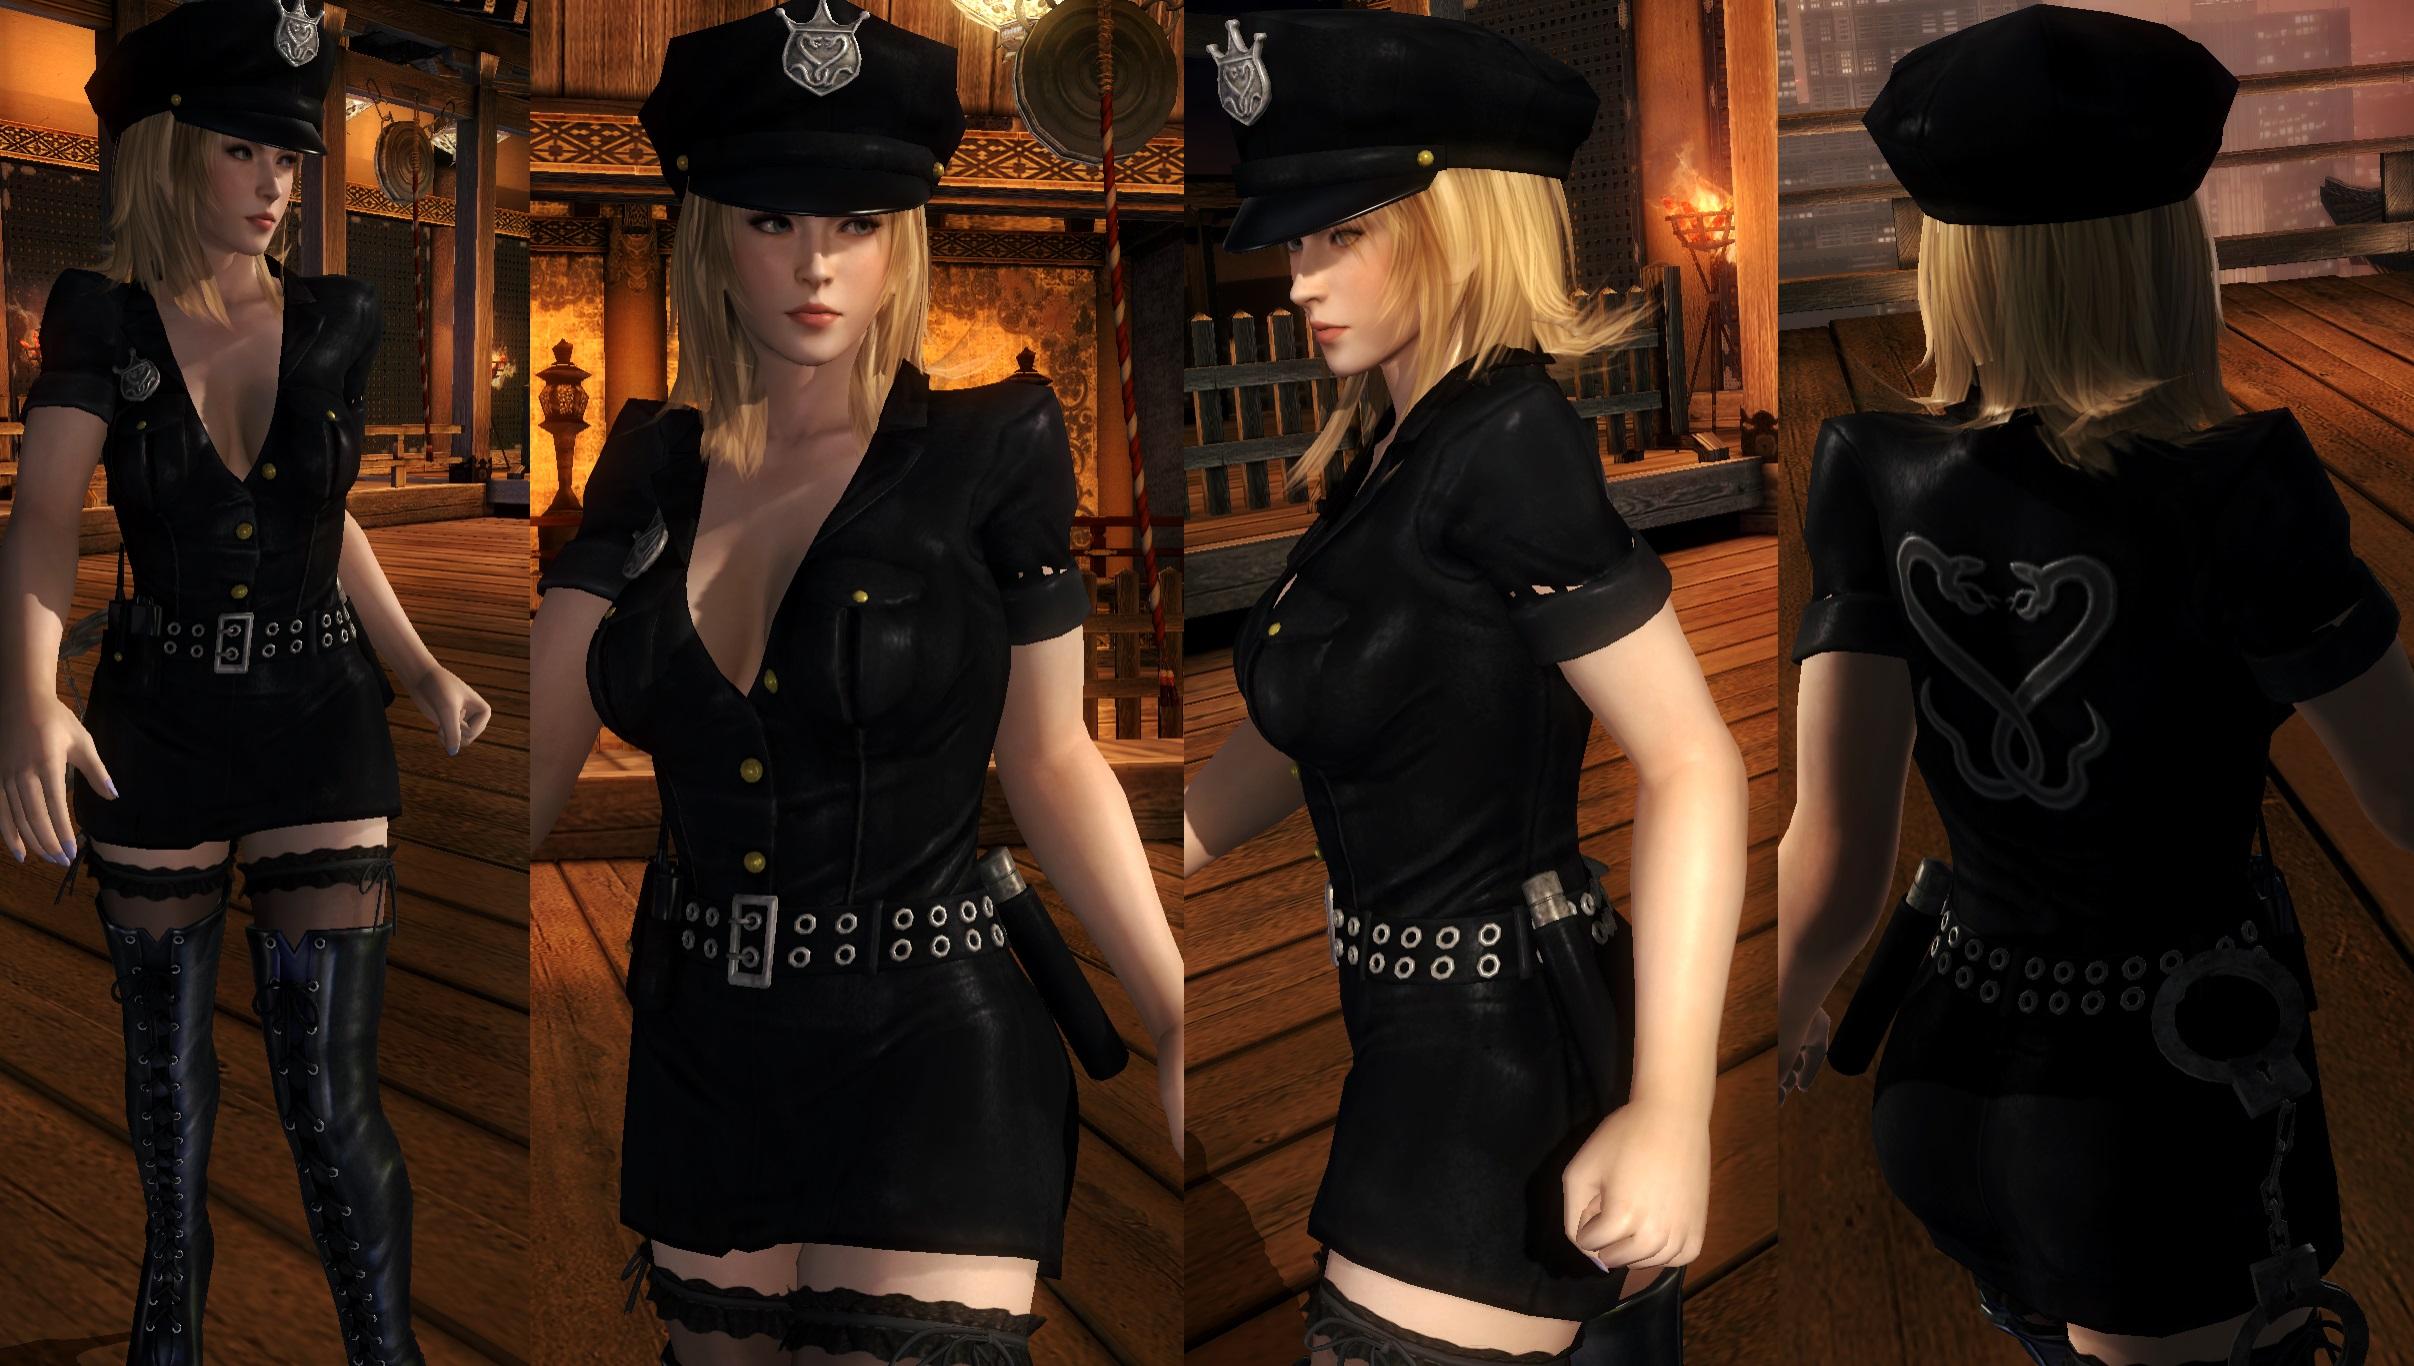 Sarah Police V2 by funnybunny666